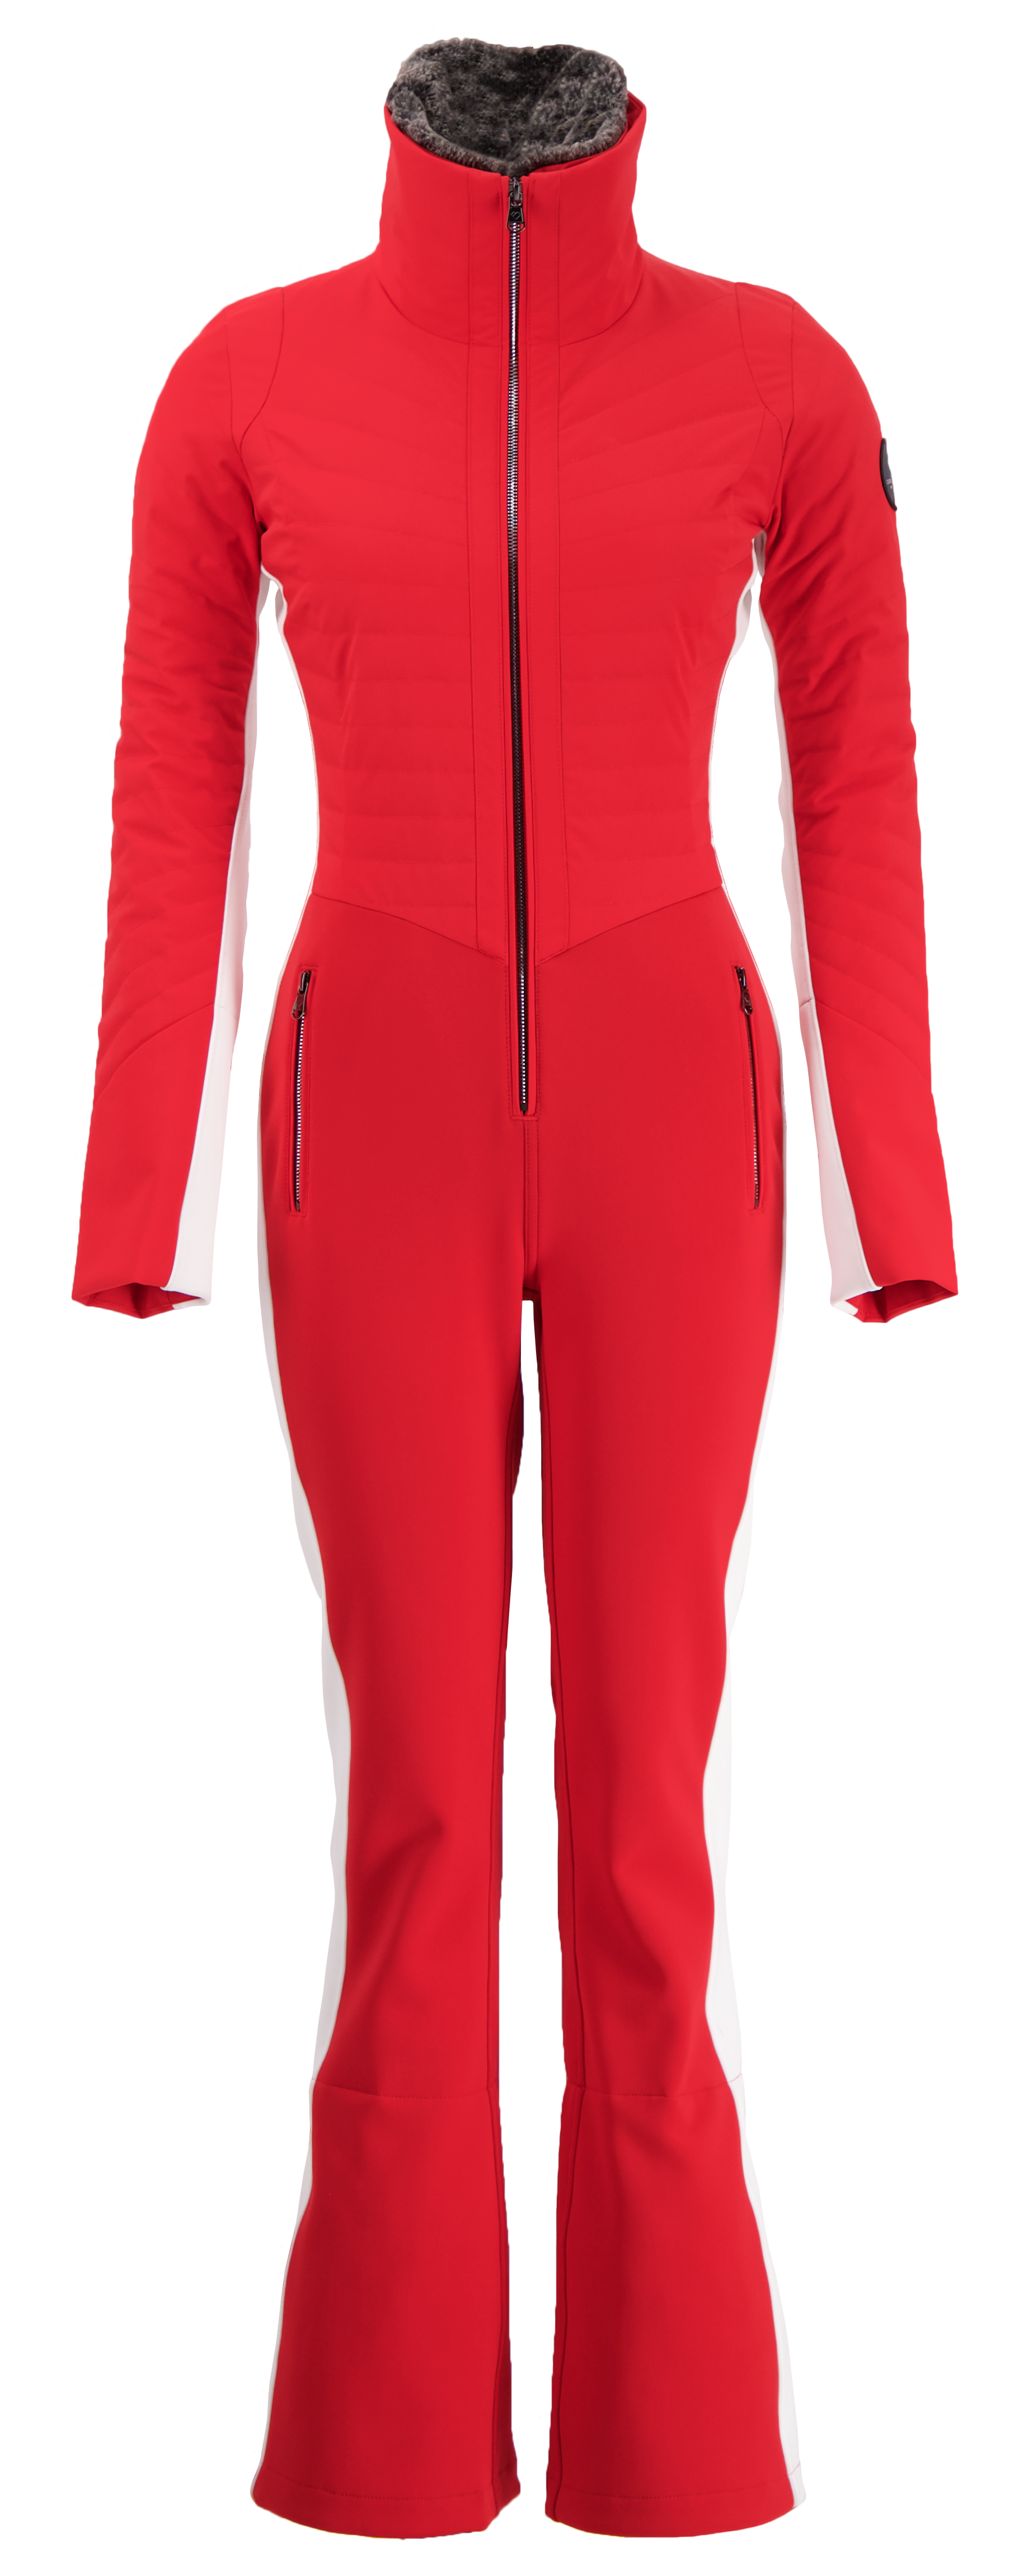 The 2021 Scott Slight 93w Women's All-Mountain Ski thumb